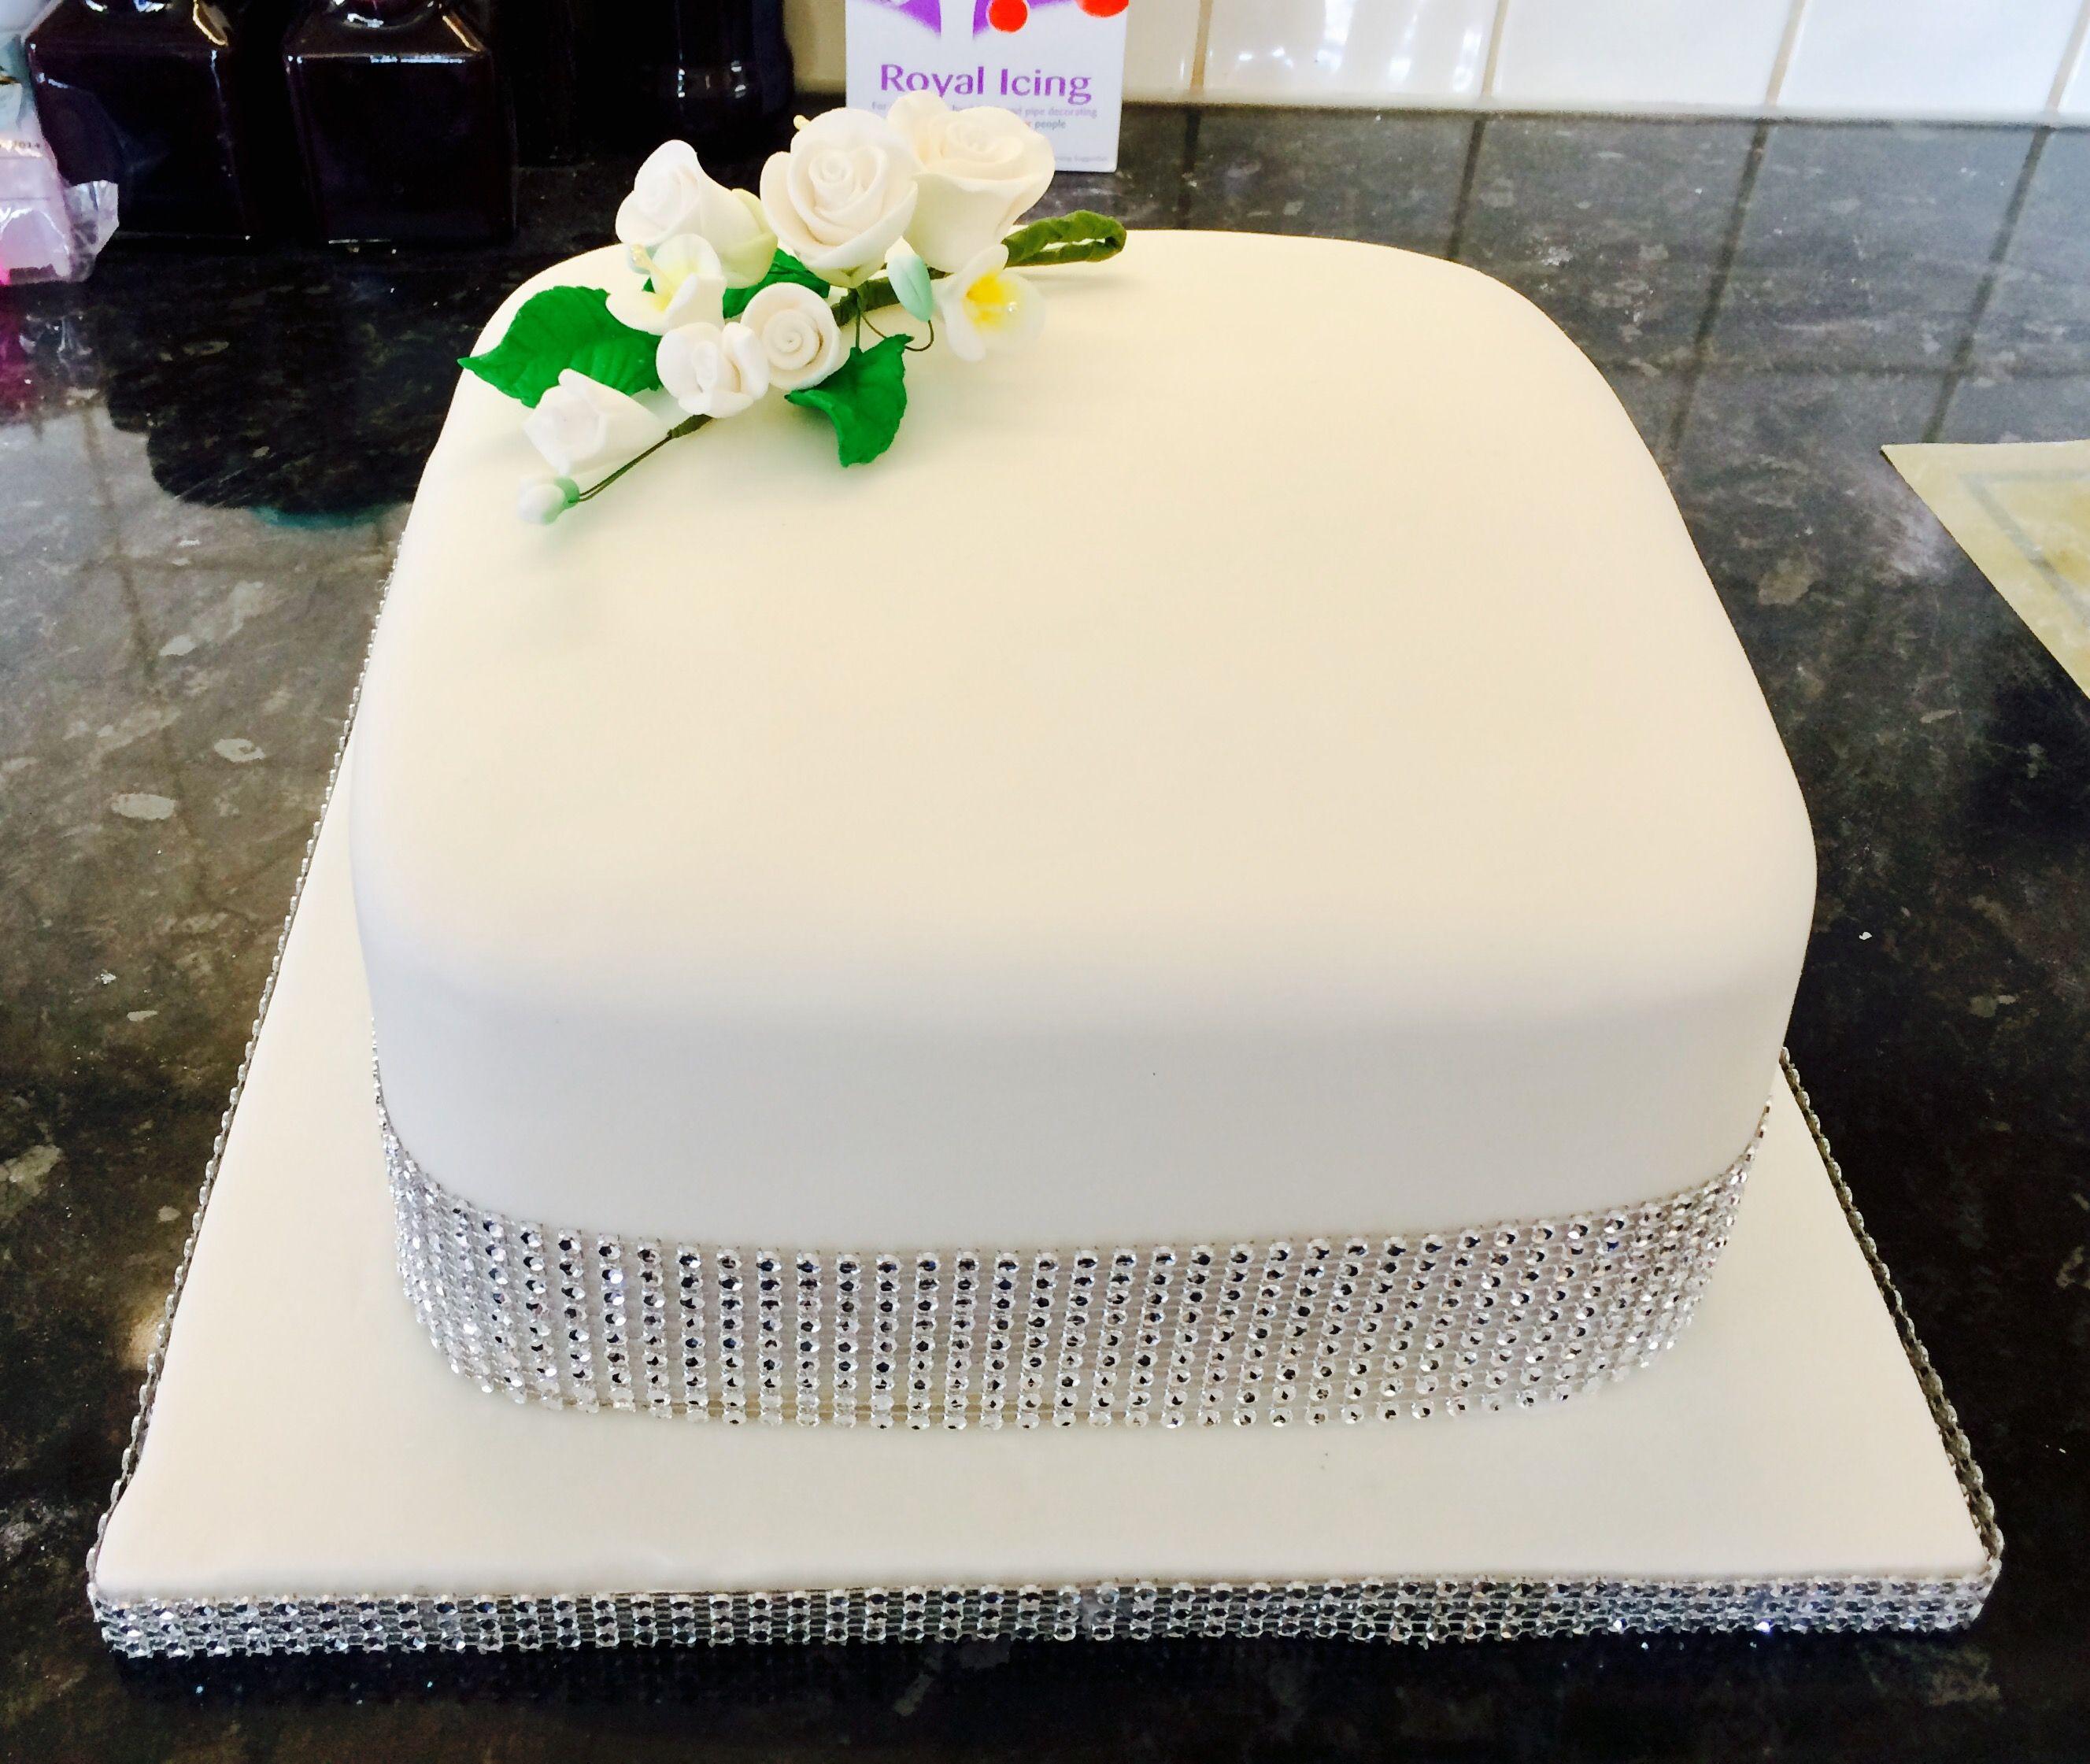 Diamond wedding anniversary cake 🎂 | Mar Mars cakes made with love ...